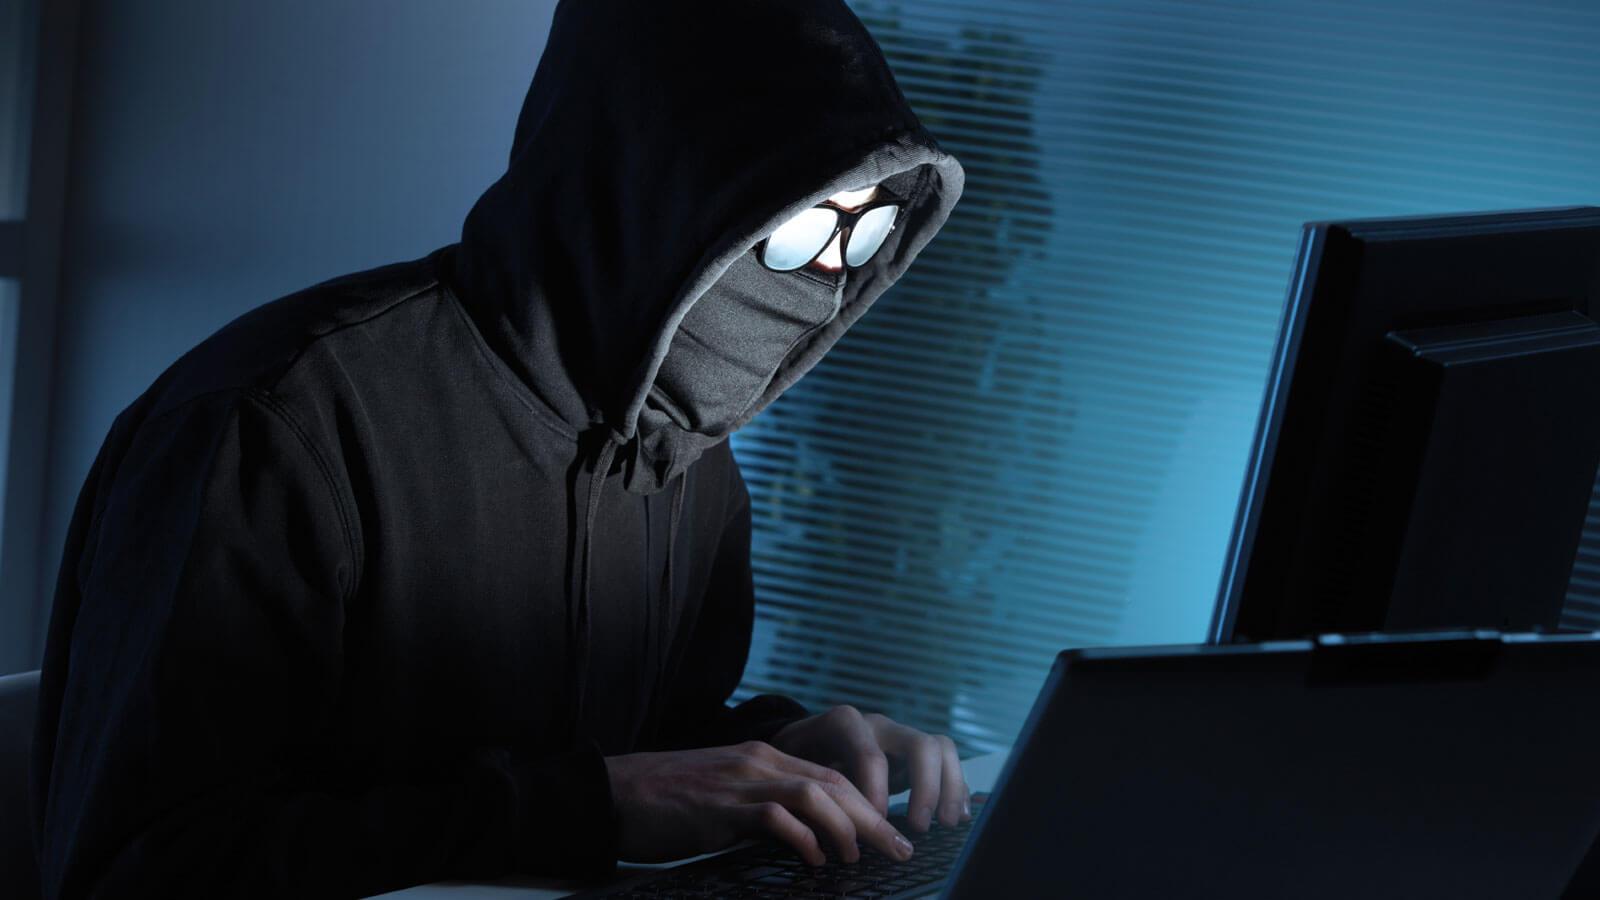 Cybercrime Stolen